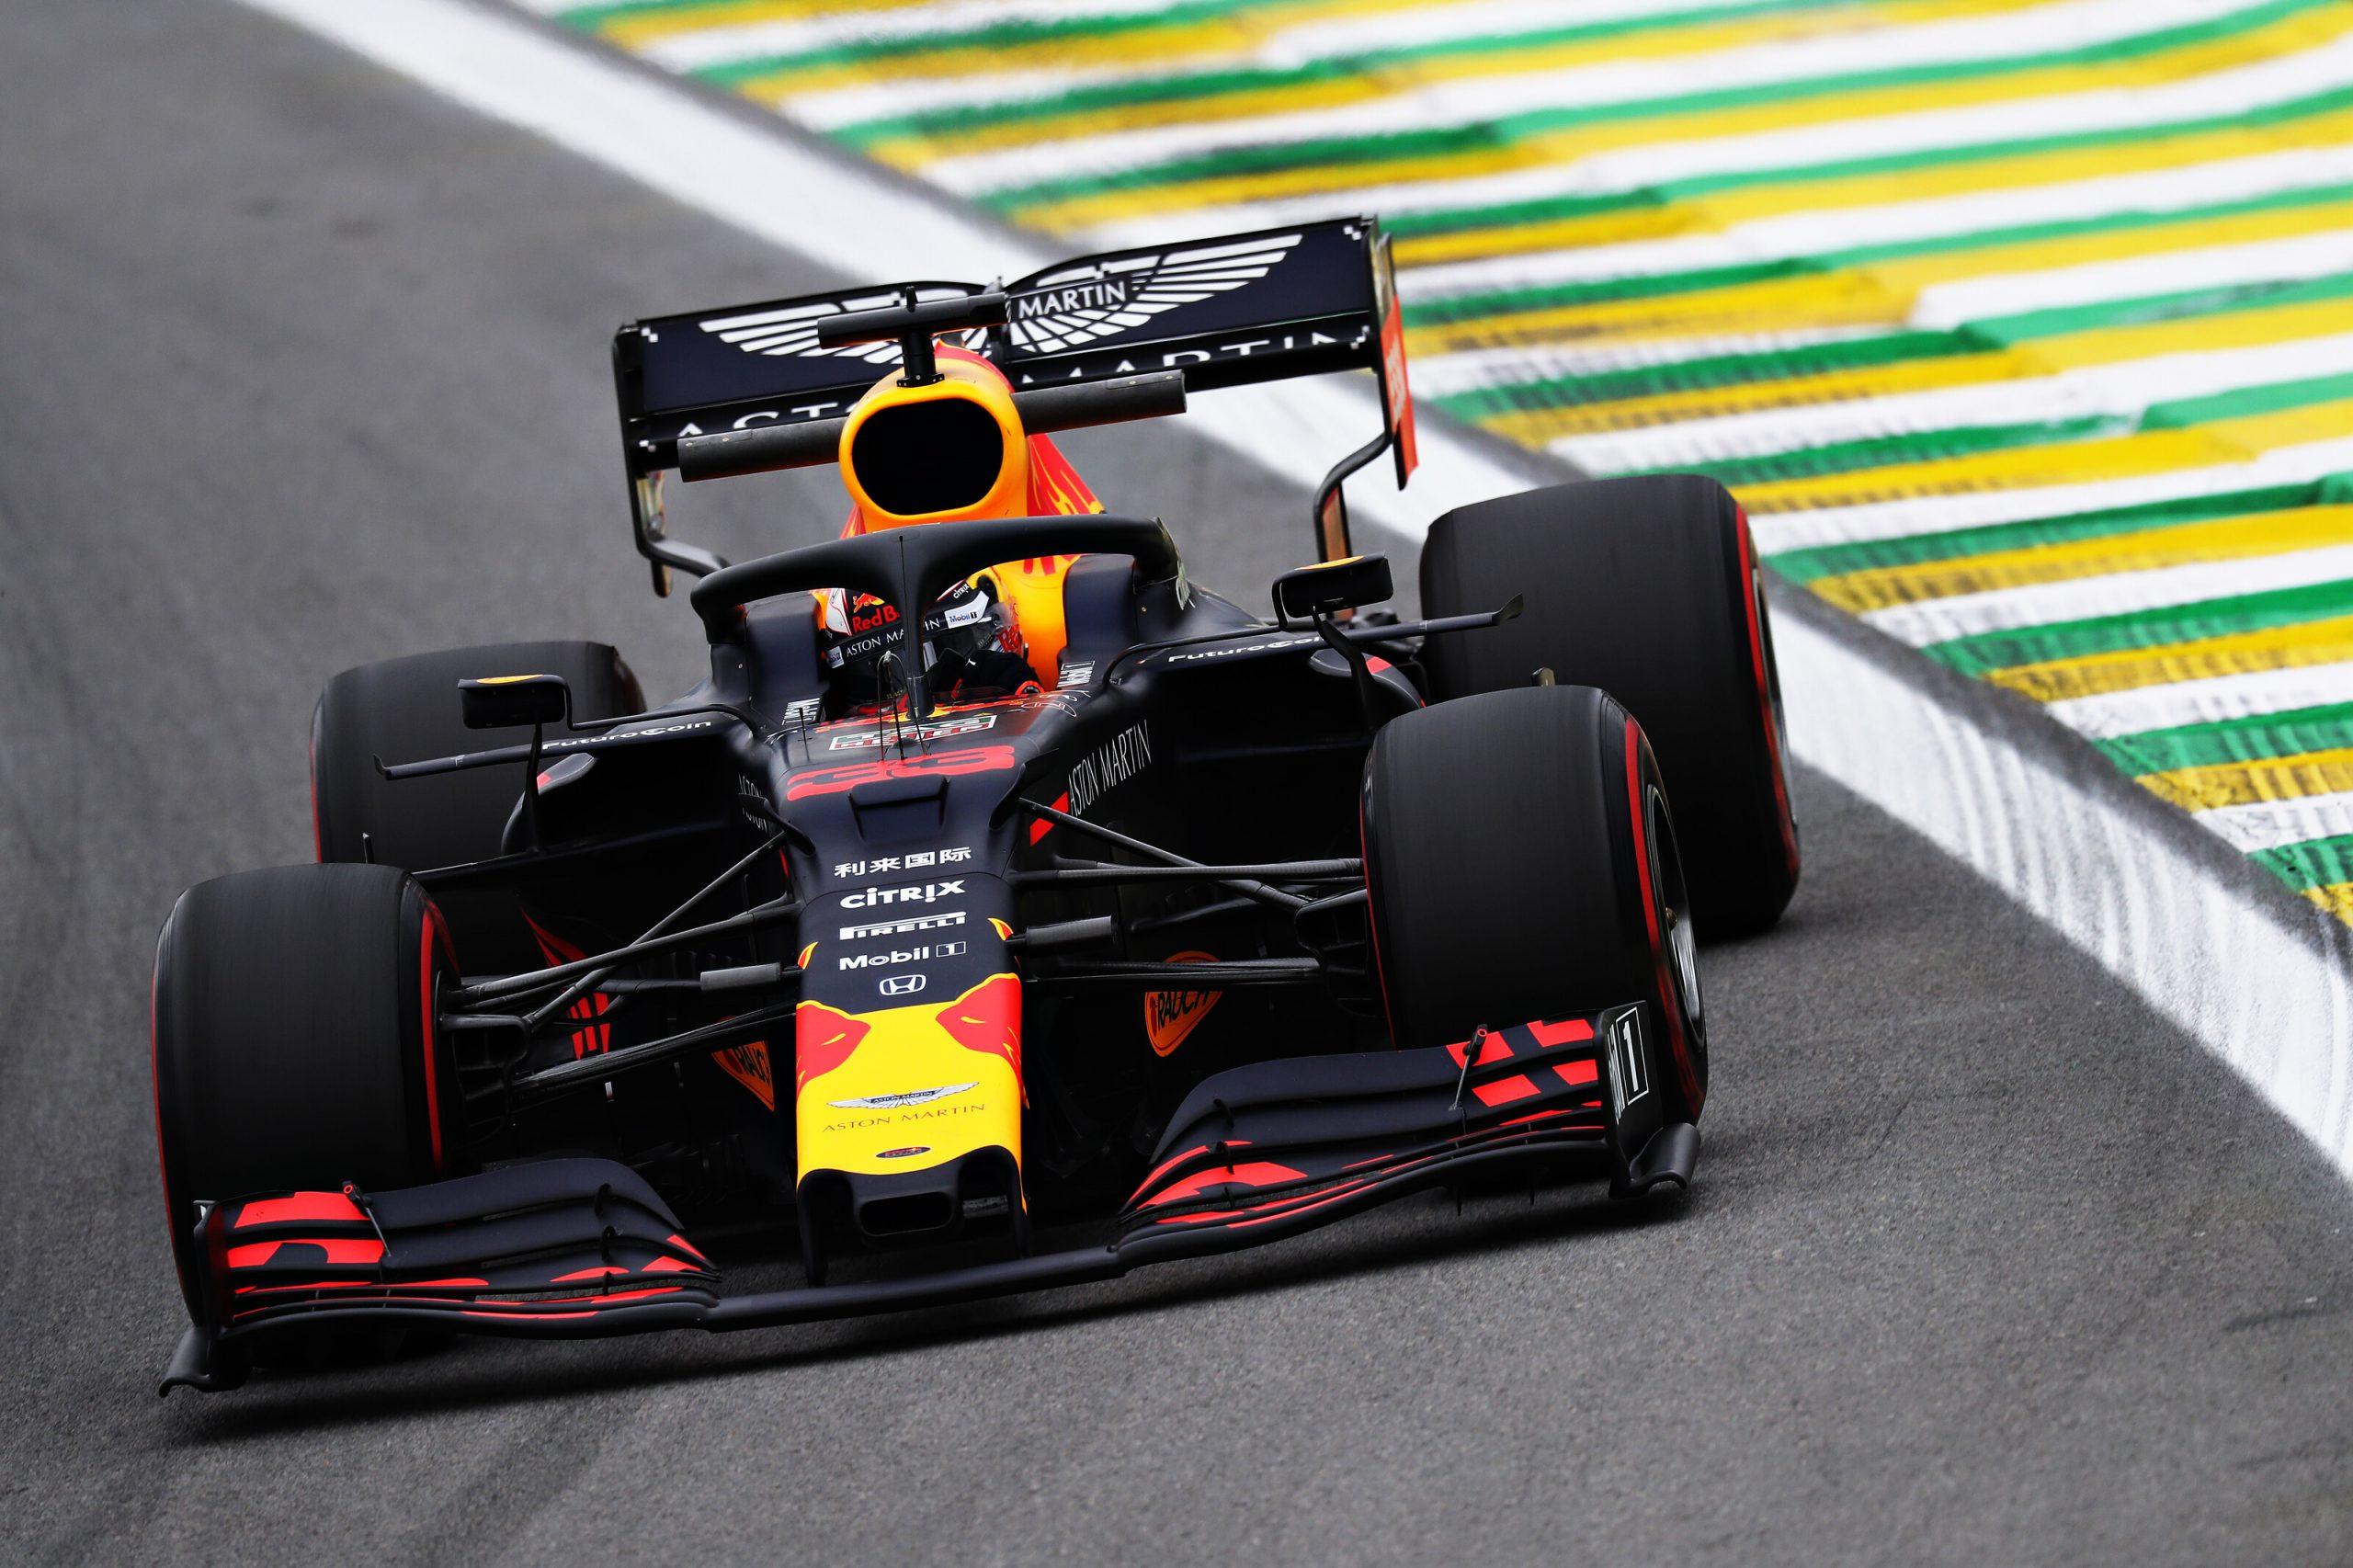 F1 Formula 1 Formula One Brazilian Grand Prix Max Verstappen Red Bull Racing